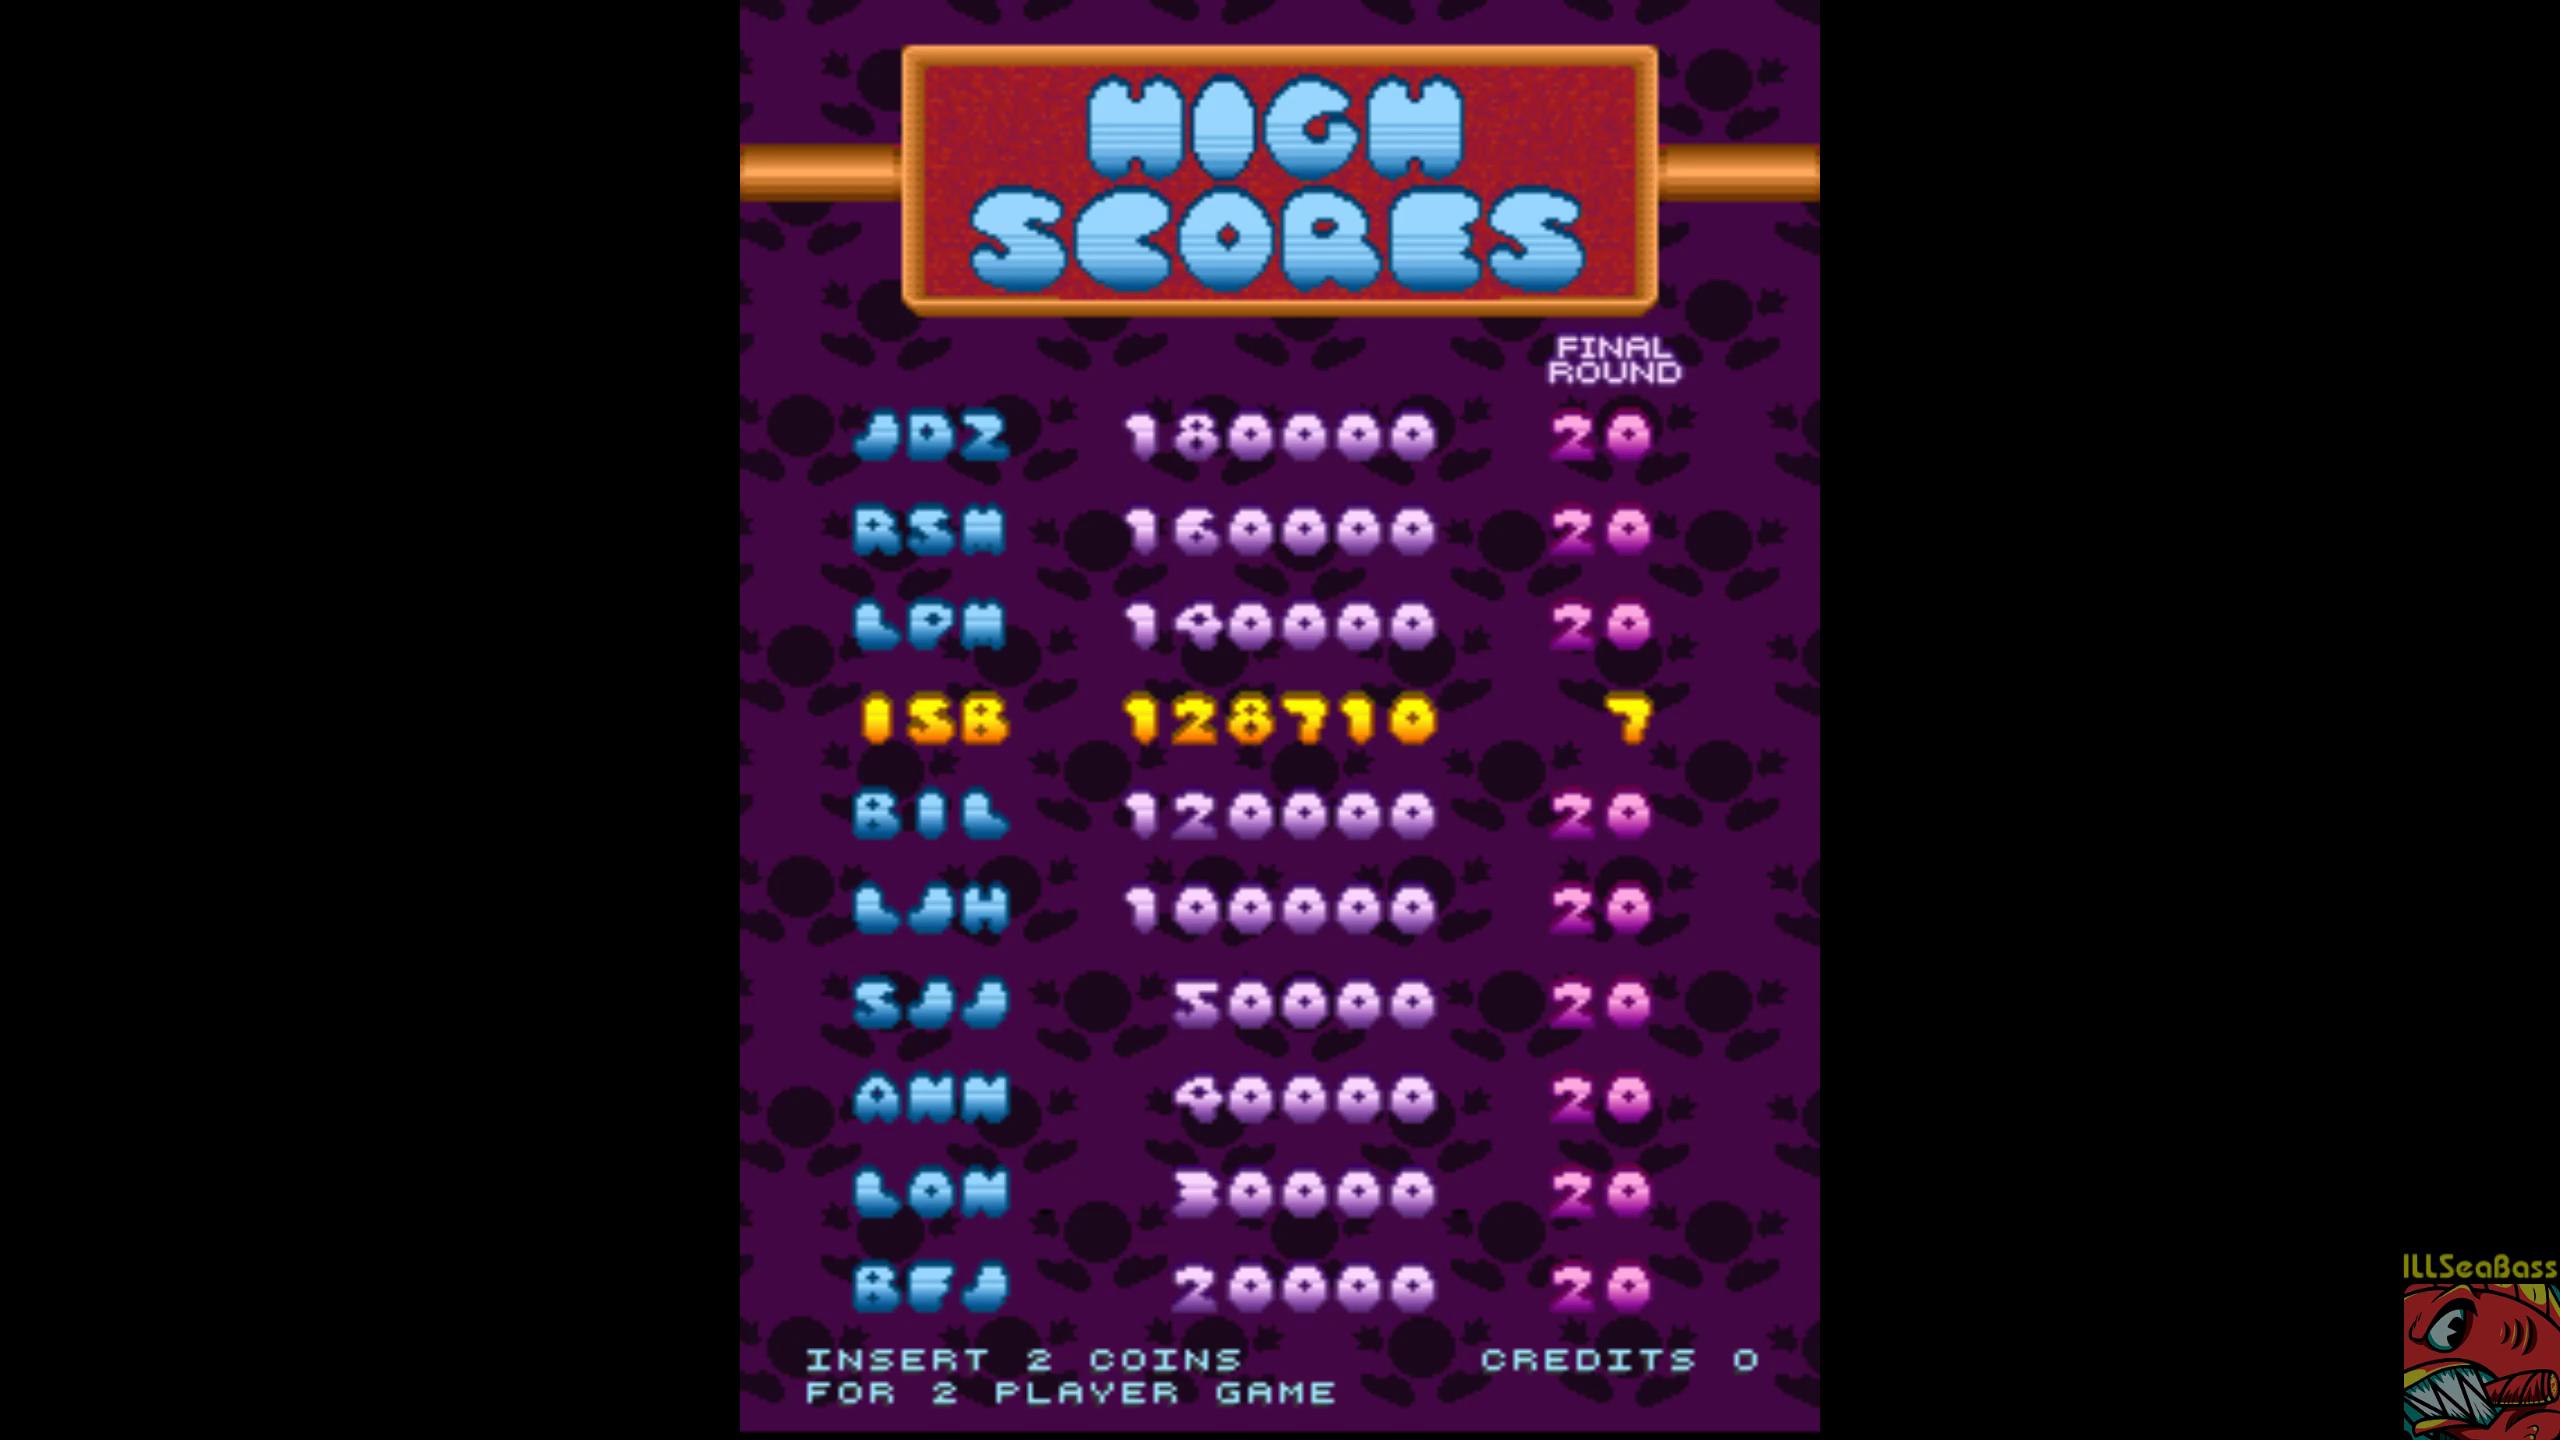 ILLSeaBass: Peggle [peggle] (Arcade Emulated / M.A.M.E.) 128,710 points on 2019-05-22 17:54:44